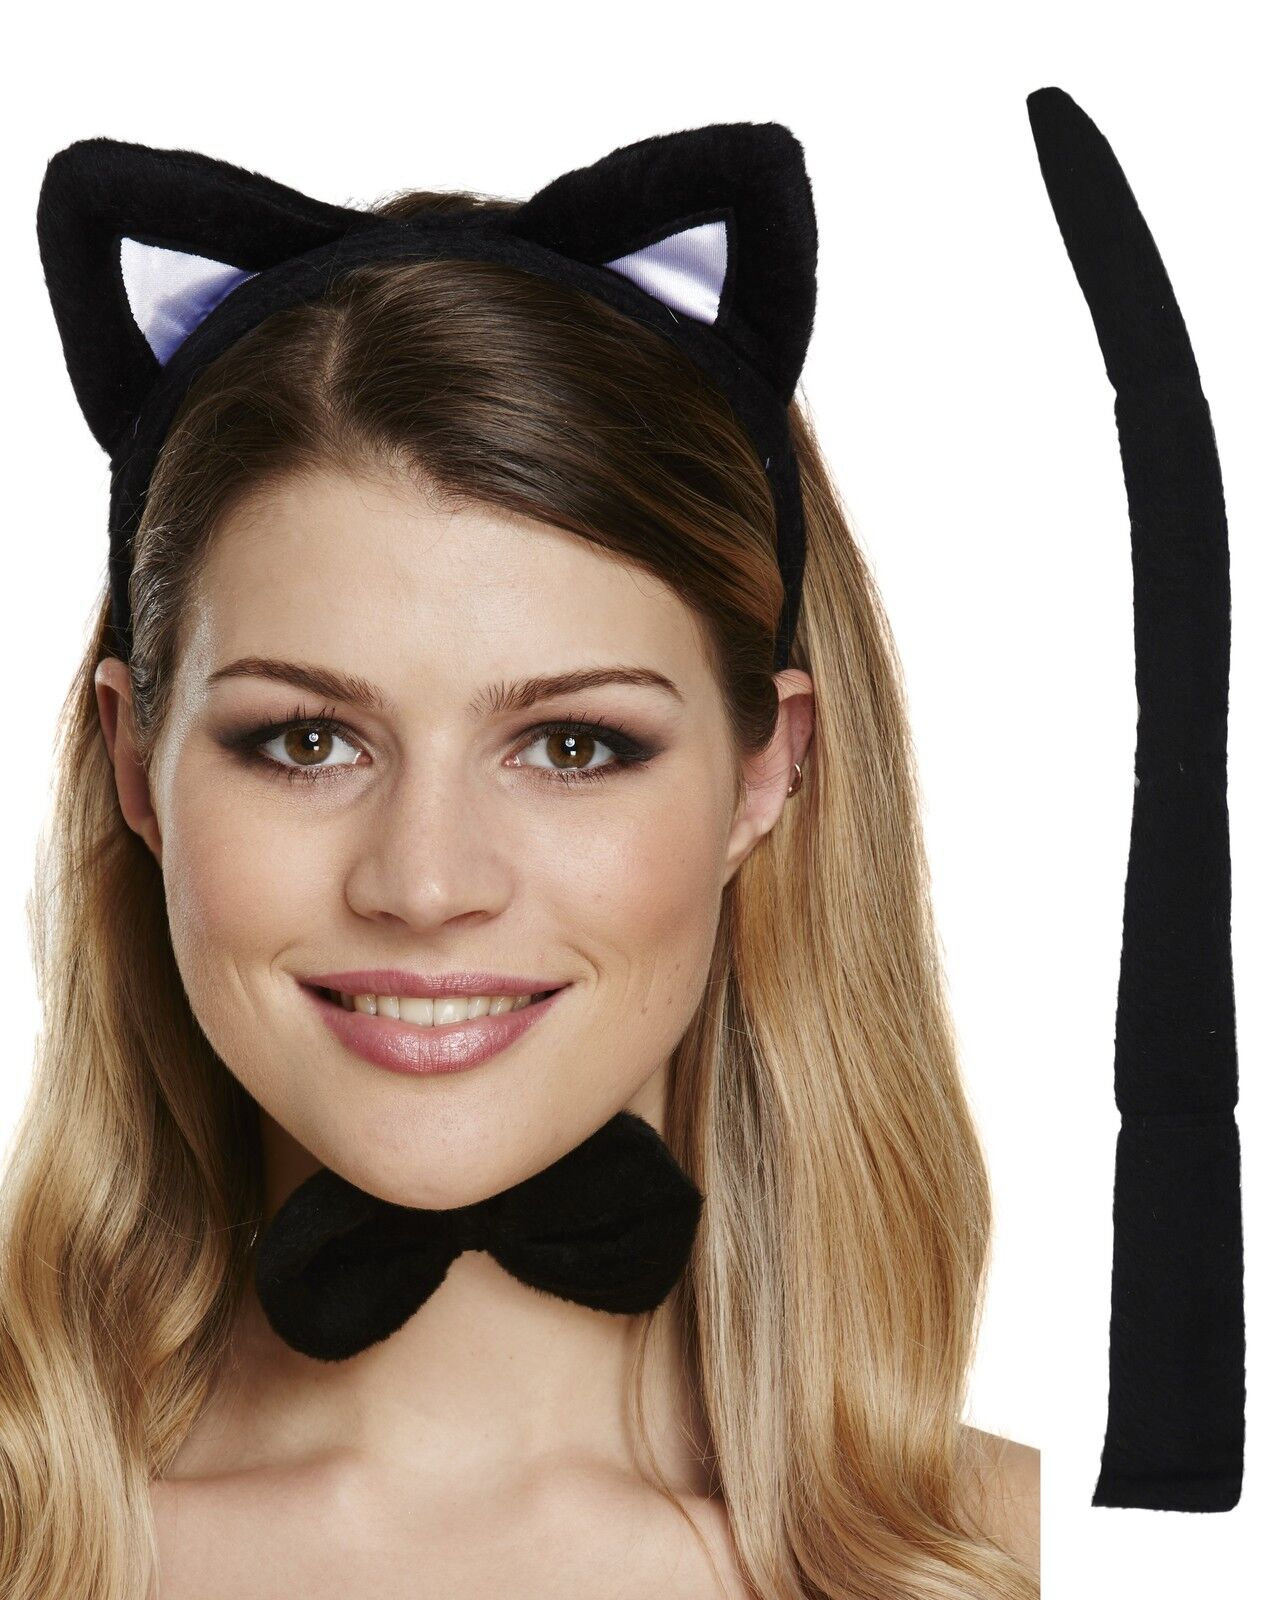 Ladies Black Cat Animal Hen Do Party Halloween Fancy Dress Costume Outfit Kit  sc 1 st  eBay & Ladies Black Cat Animal Hen Do Party Halloween Fancy Dress Costume ...